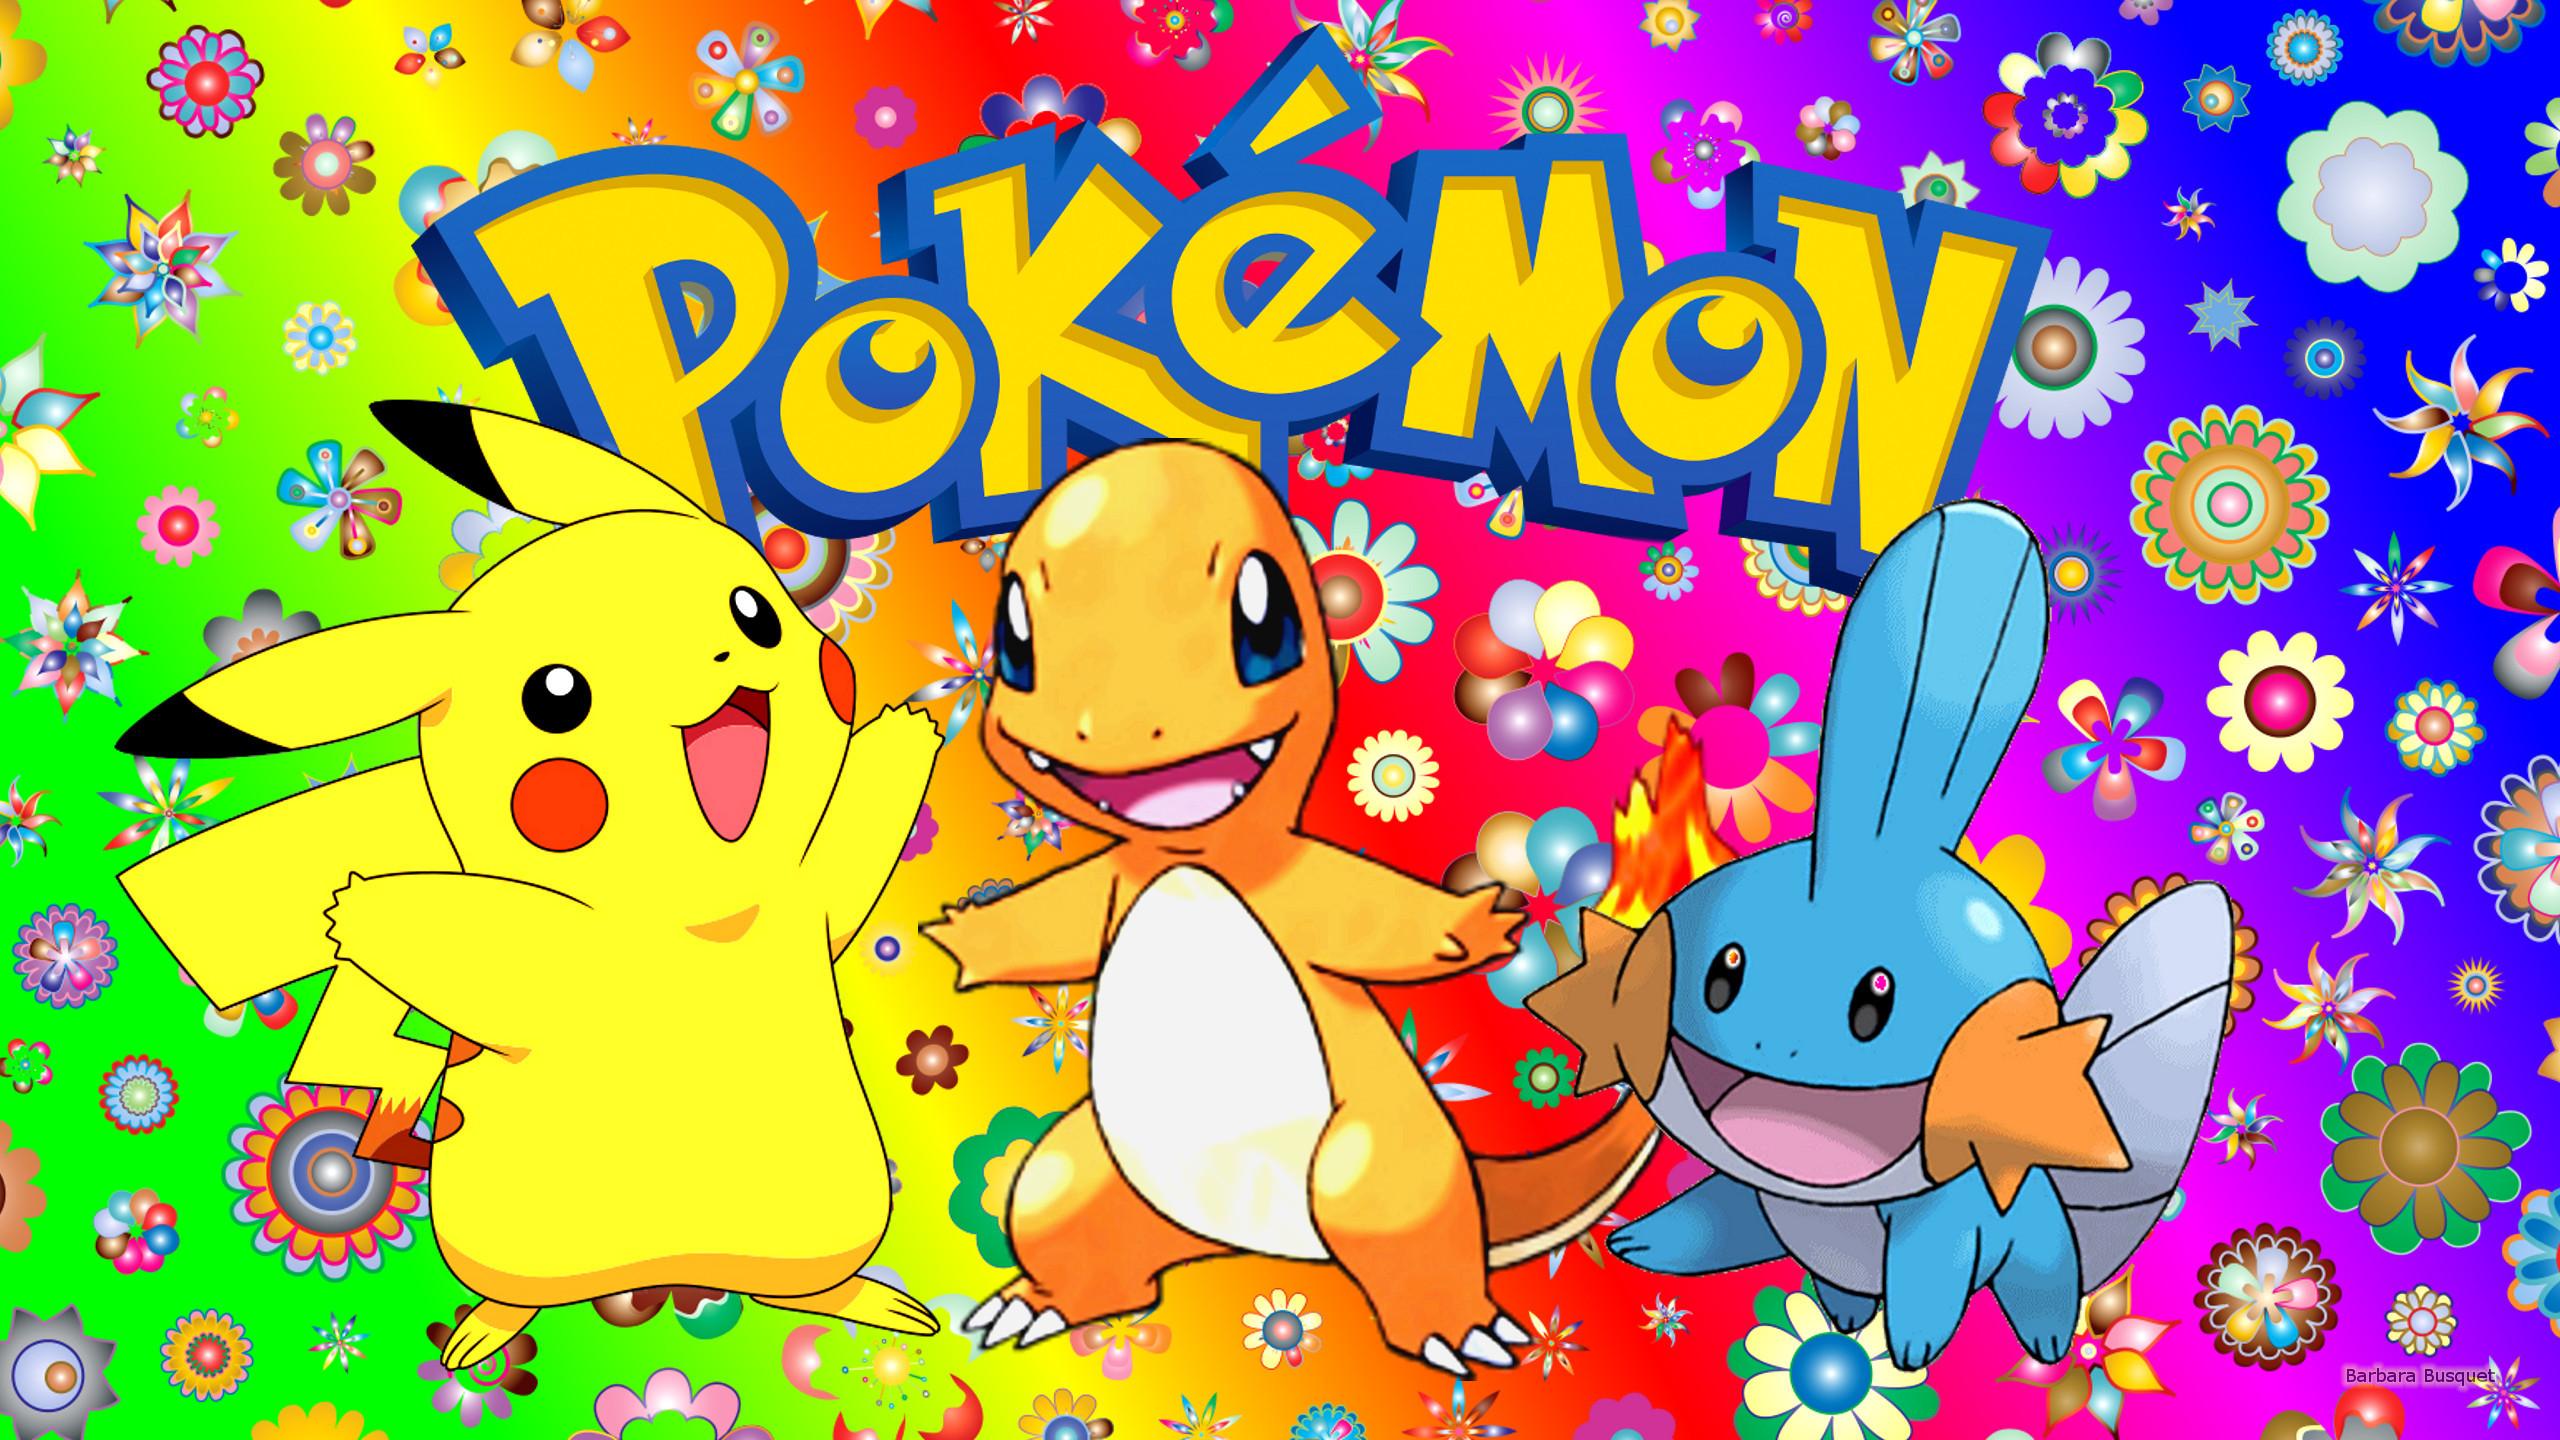 Colorful Pokemon wallpaper with Pikachu, Charmander and Mudkip.